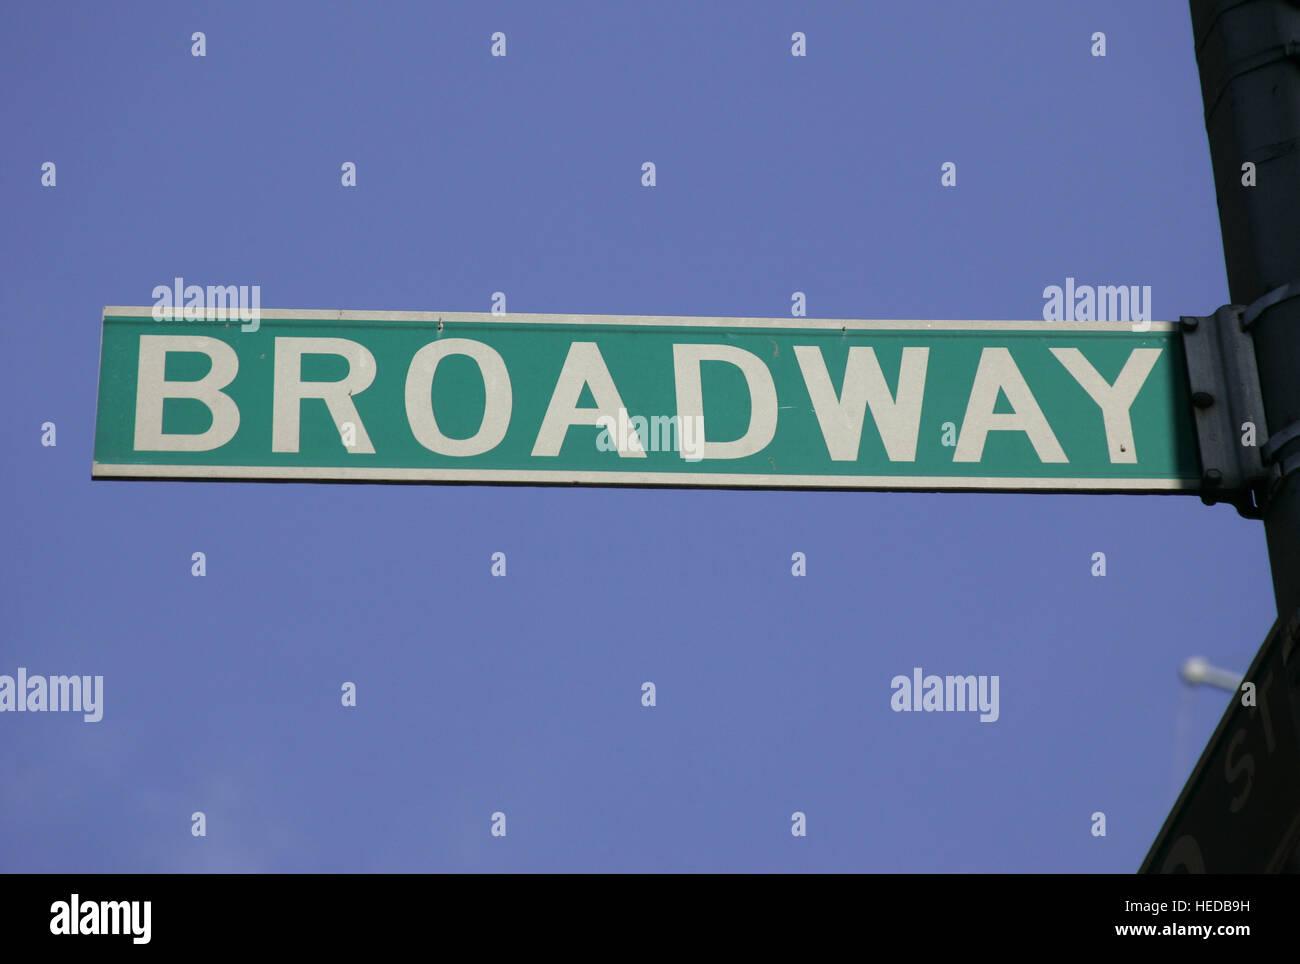 Road sign, Broadway, New York, USA - Stock Image